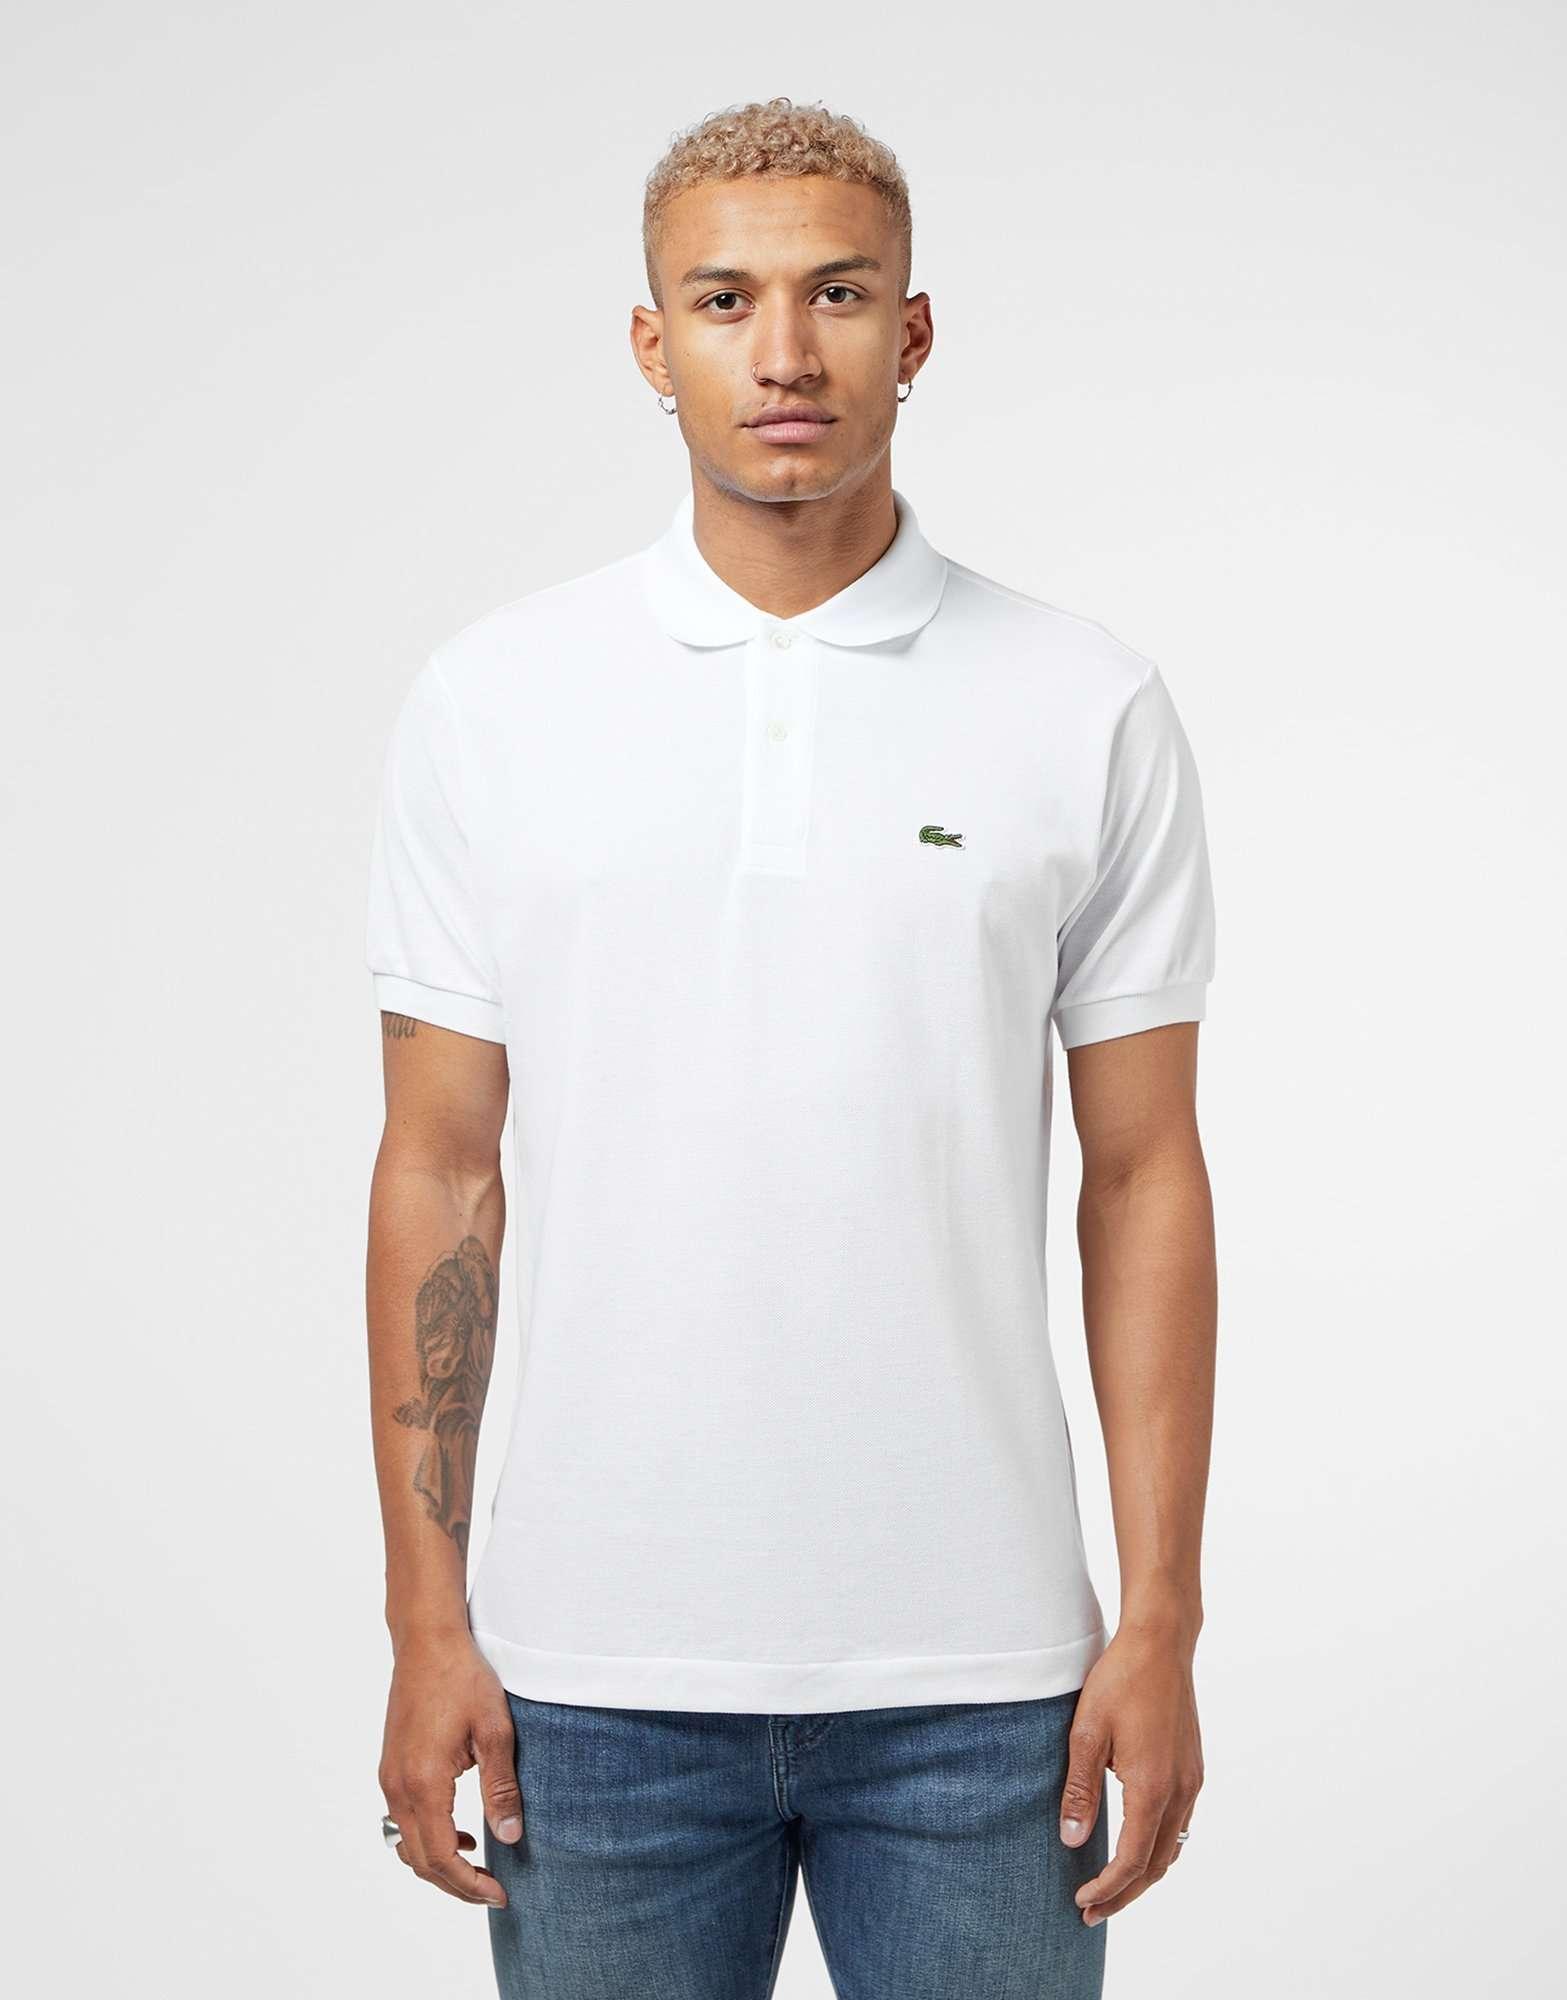 lacoste l1212 short sleeve polo shirt scotts menswear. Black Bedroom Furniture Sets. Home Design Ideas